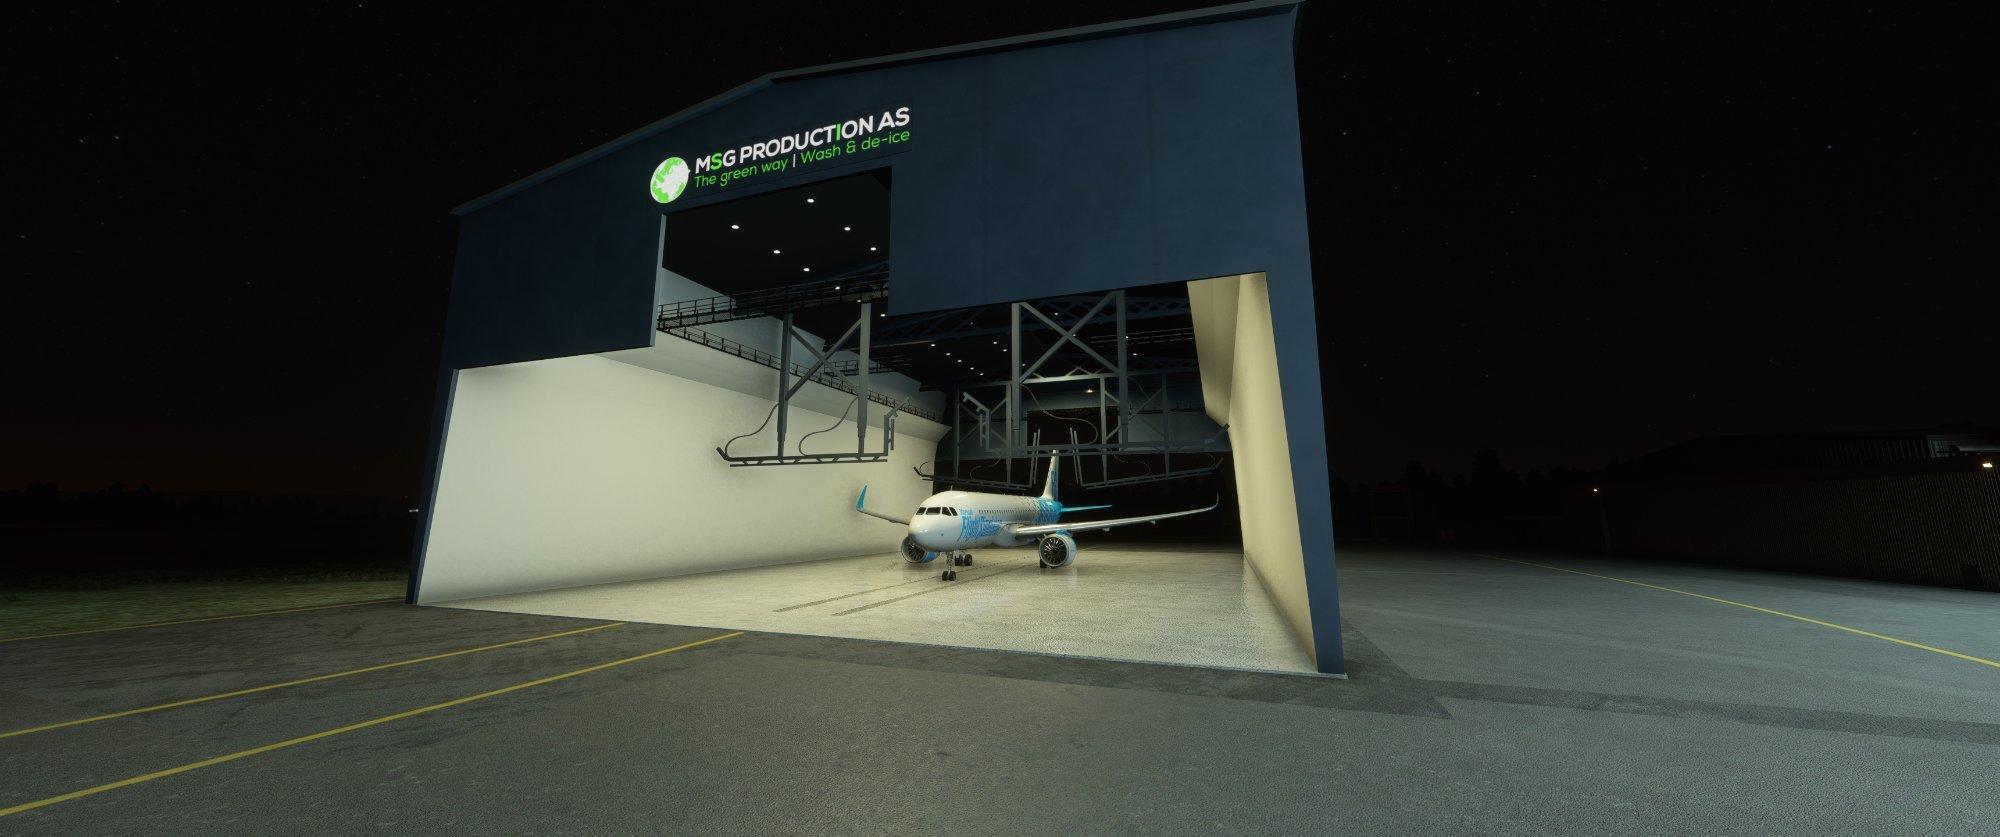 Microsoft Flight Simulator Screenshot 2021.07.16 - 22.54.11.15.jpg